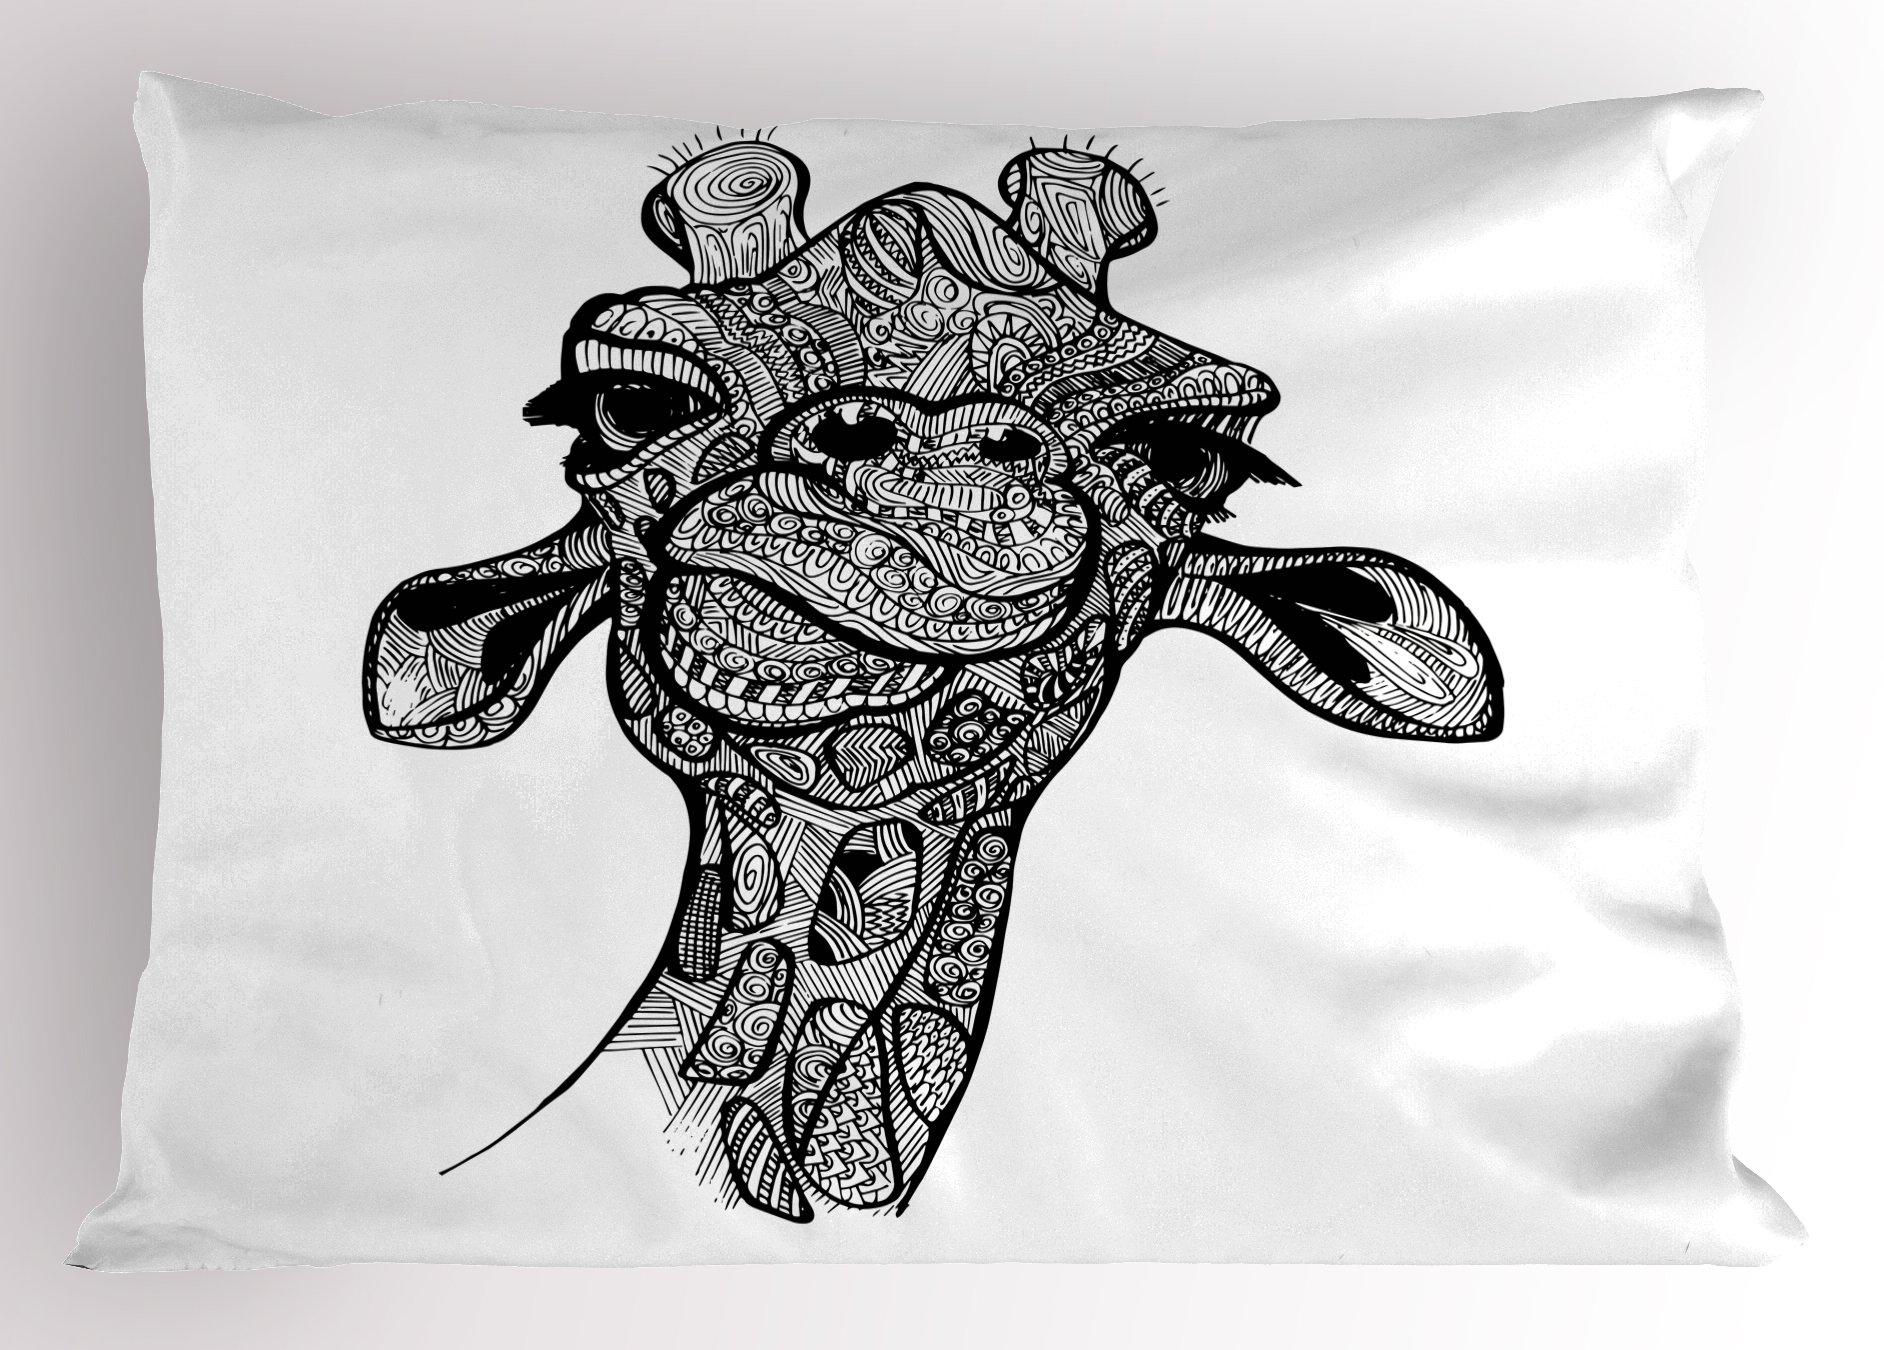 Lunarable Giraffe Pillow Sham, Line Patterned Cute Funny Animal Geometrical Circles and Swirls Design Monochrome, Decorative Standard King Size Printed Pillowcase, 36 X 20 Inches, Black White